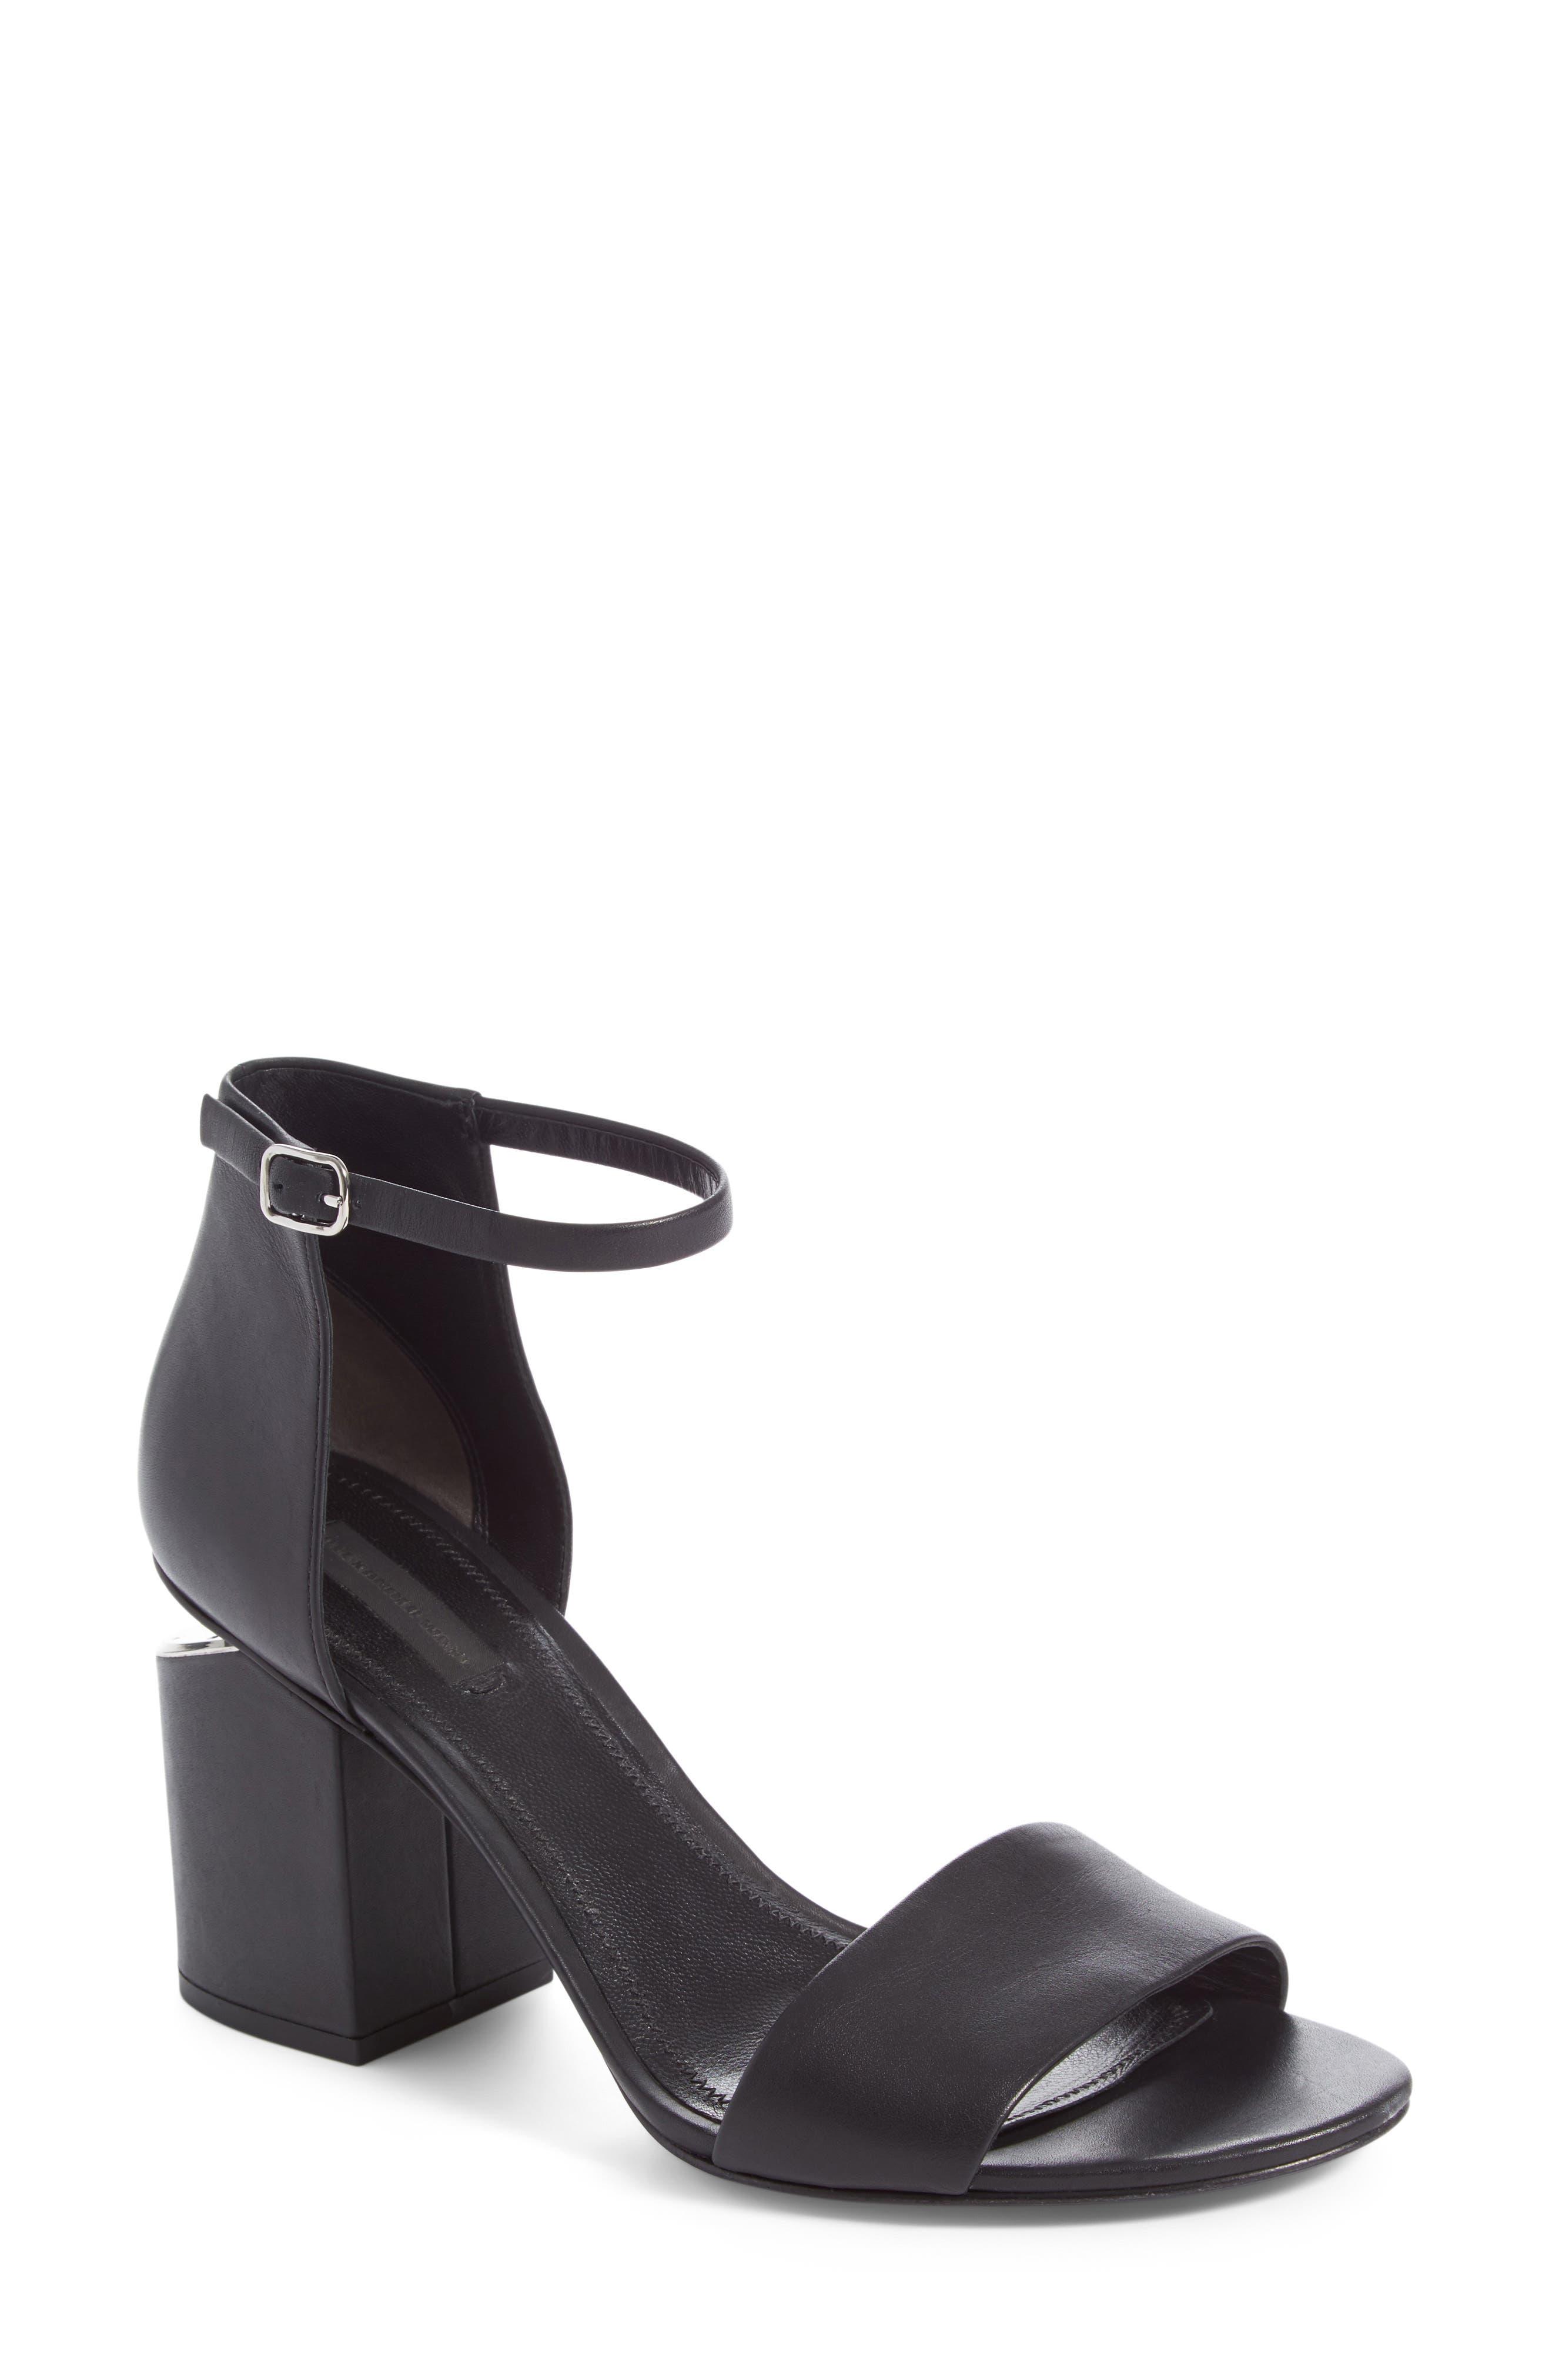 'Abby' Ankle Strap Sandal,                             Alternate thumbnail 2, color,                             BLACK